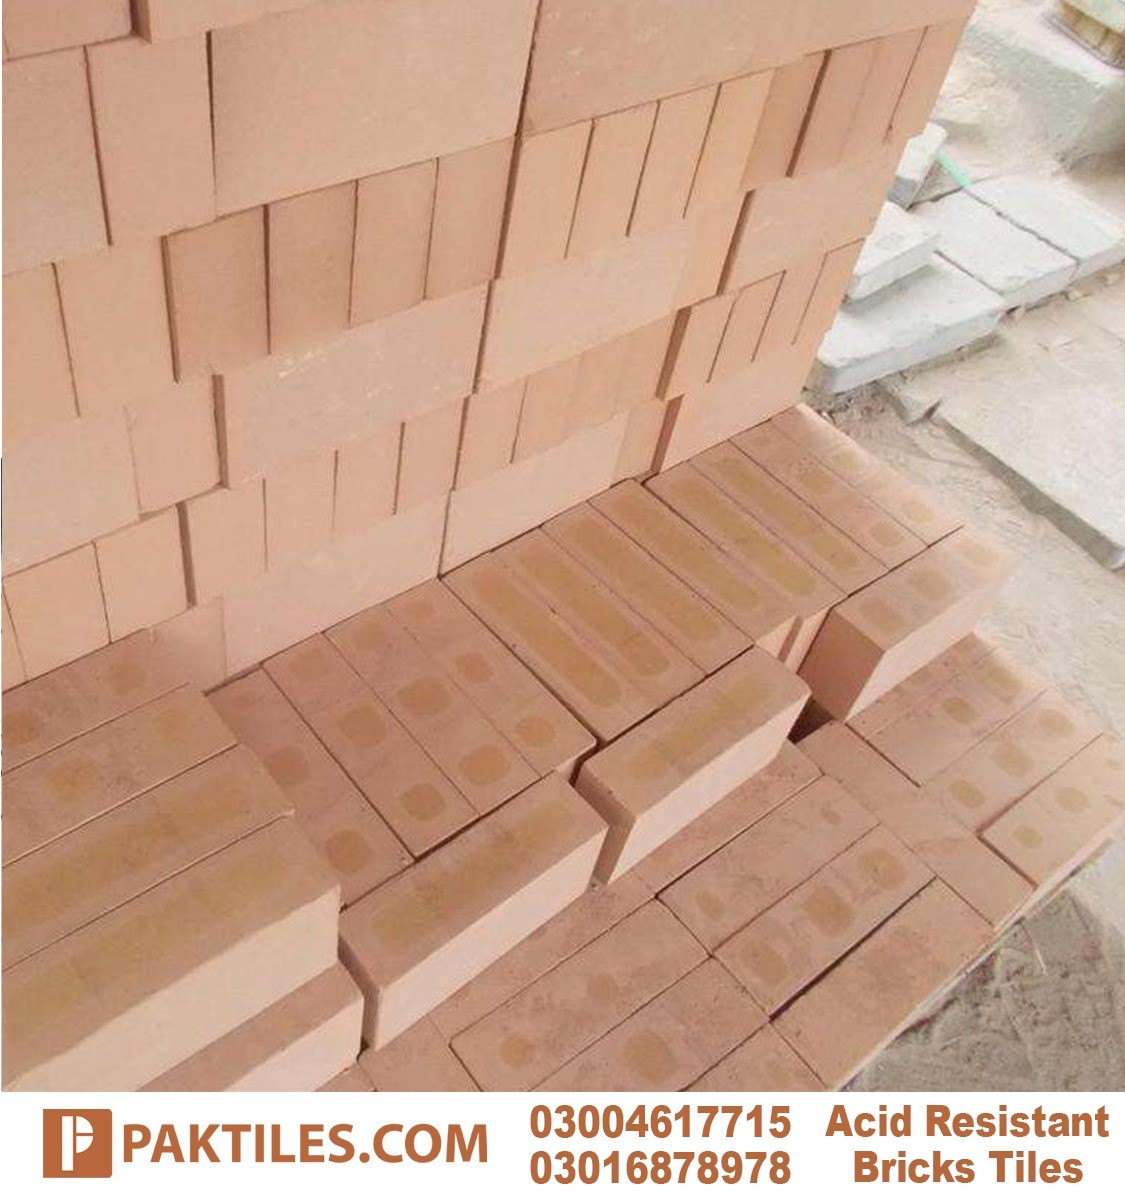 Acid Resistant Bricks Specification